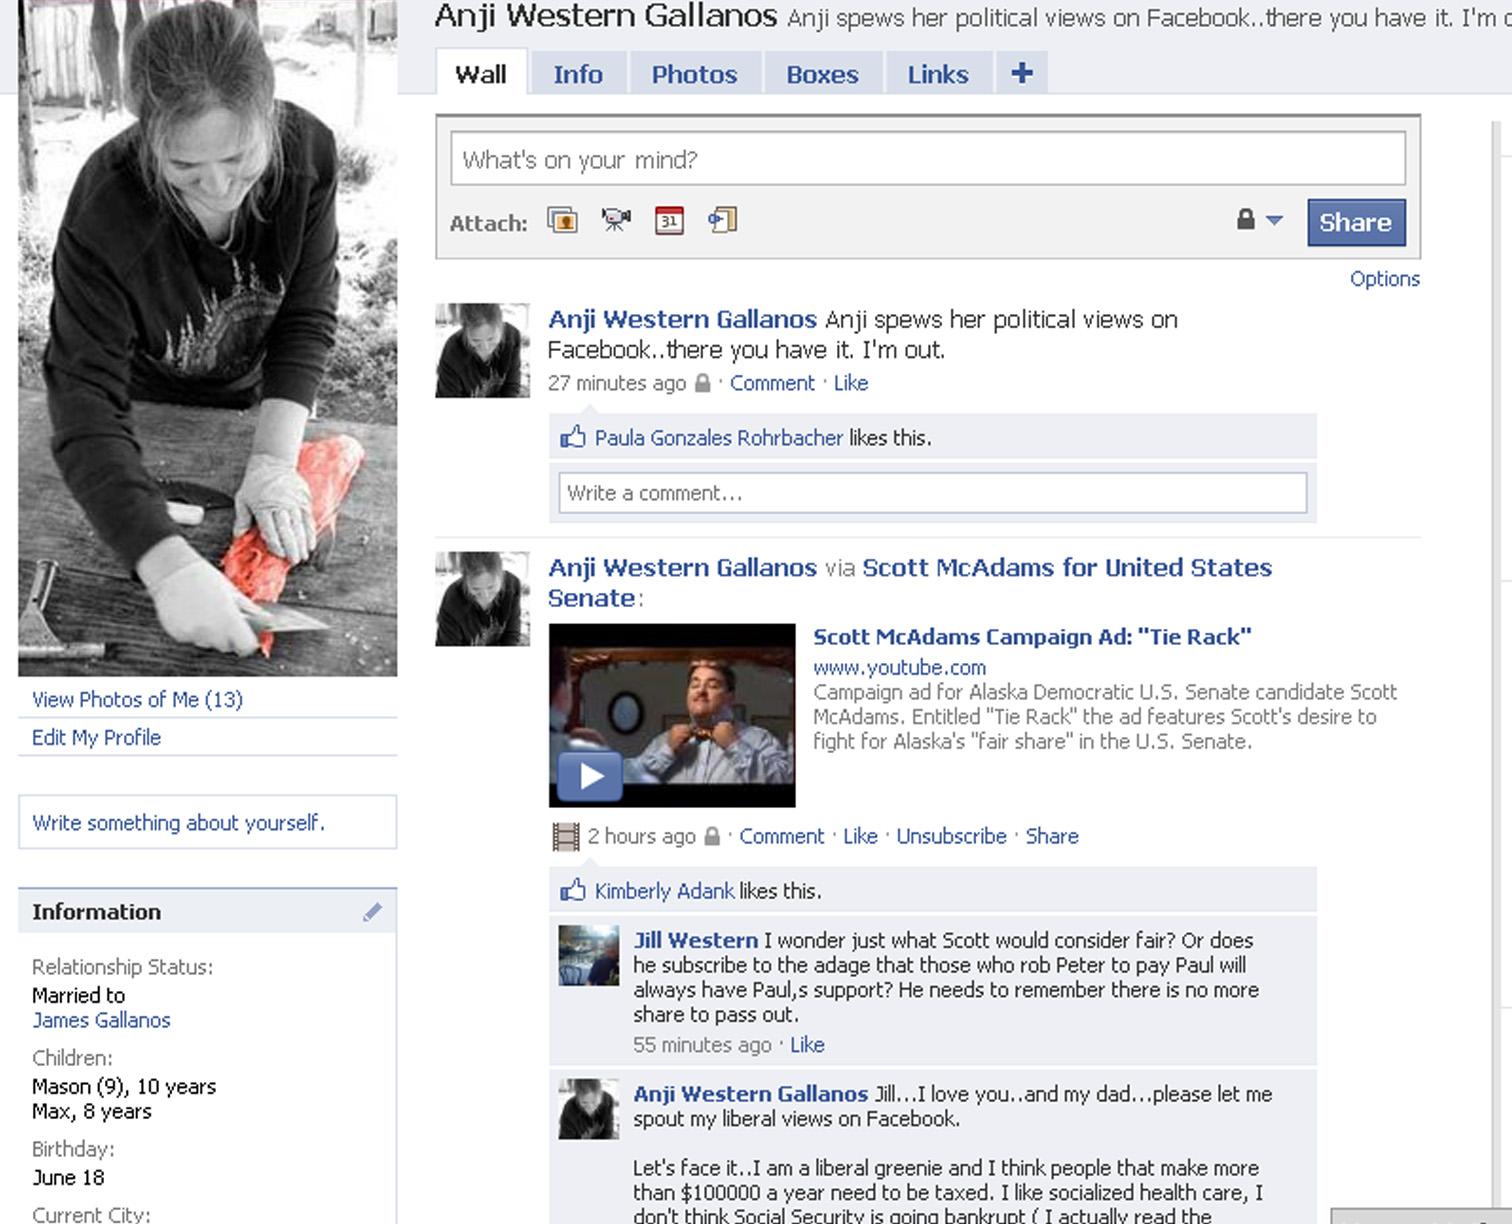 http://2.bp.blogspot.com/__HR41JgBsSM/TKYjJbVI0NI/AAAAAAAABoM/uN-TkEKbOFY/s1600/Facebook%2Bprofile.jpg